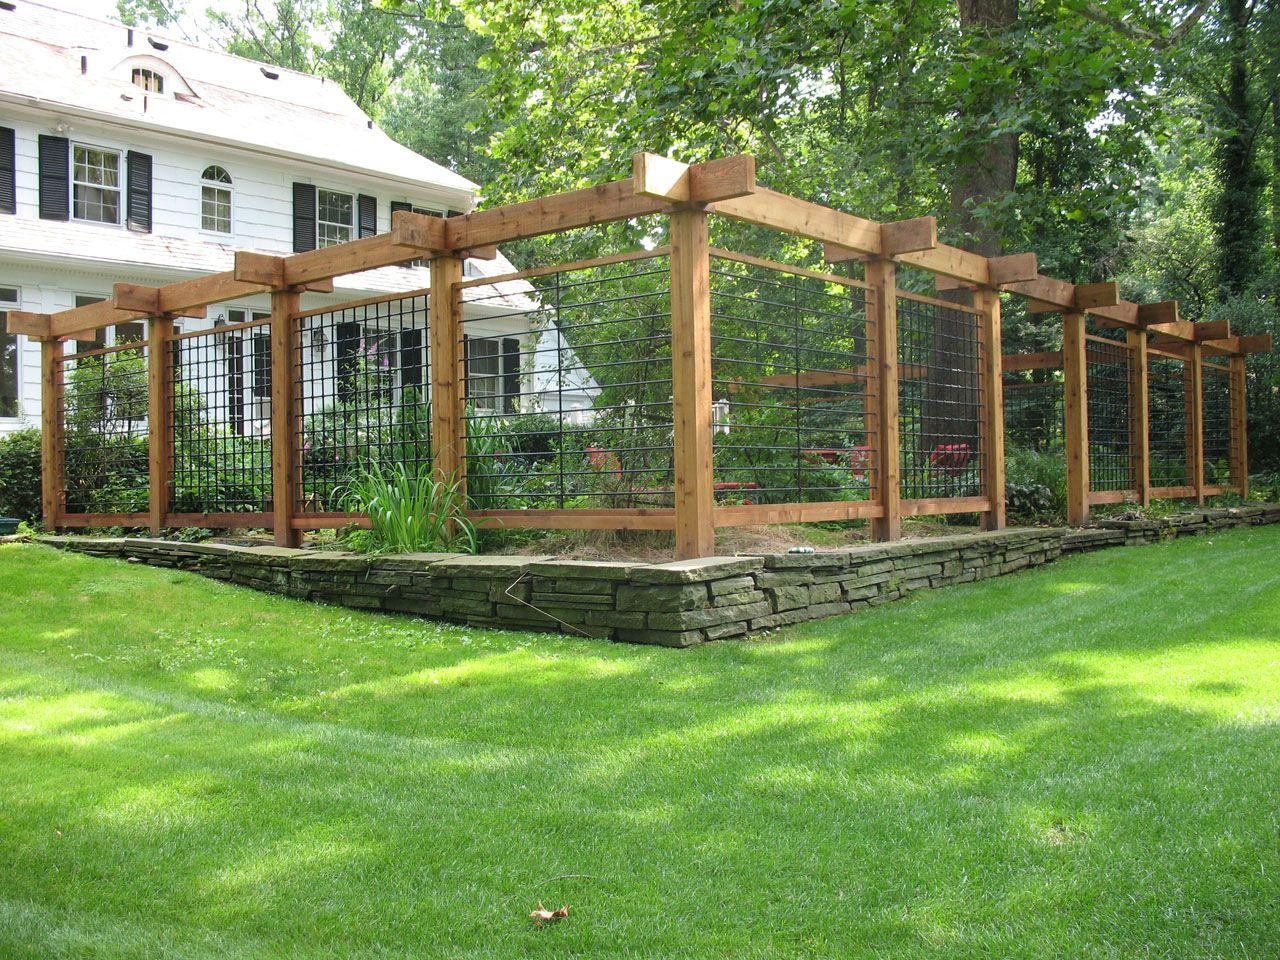 25 ideas for decorating your garden fence diy fenced on backyard garden fence decor ideas id=39110